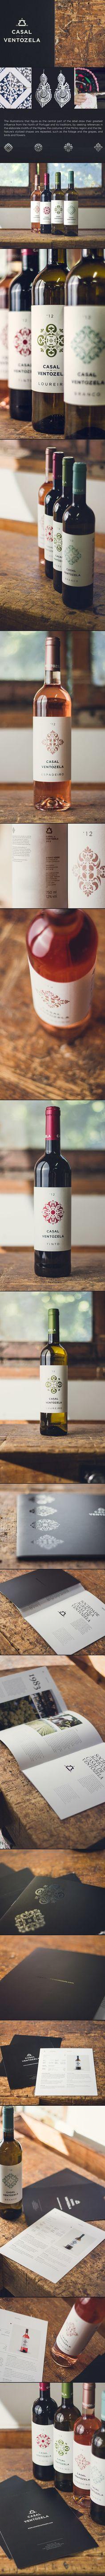 packaging - branding - print / casal de ventozela by gen design studio, via Behance